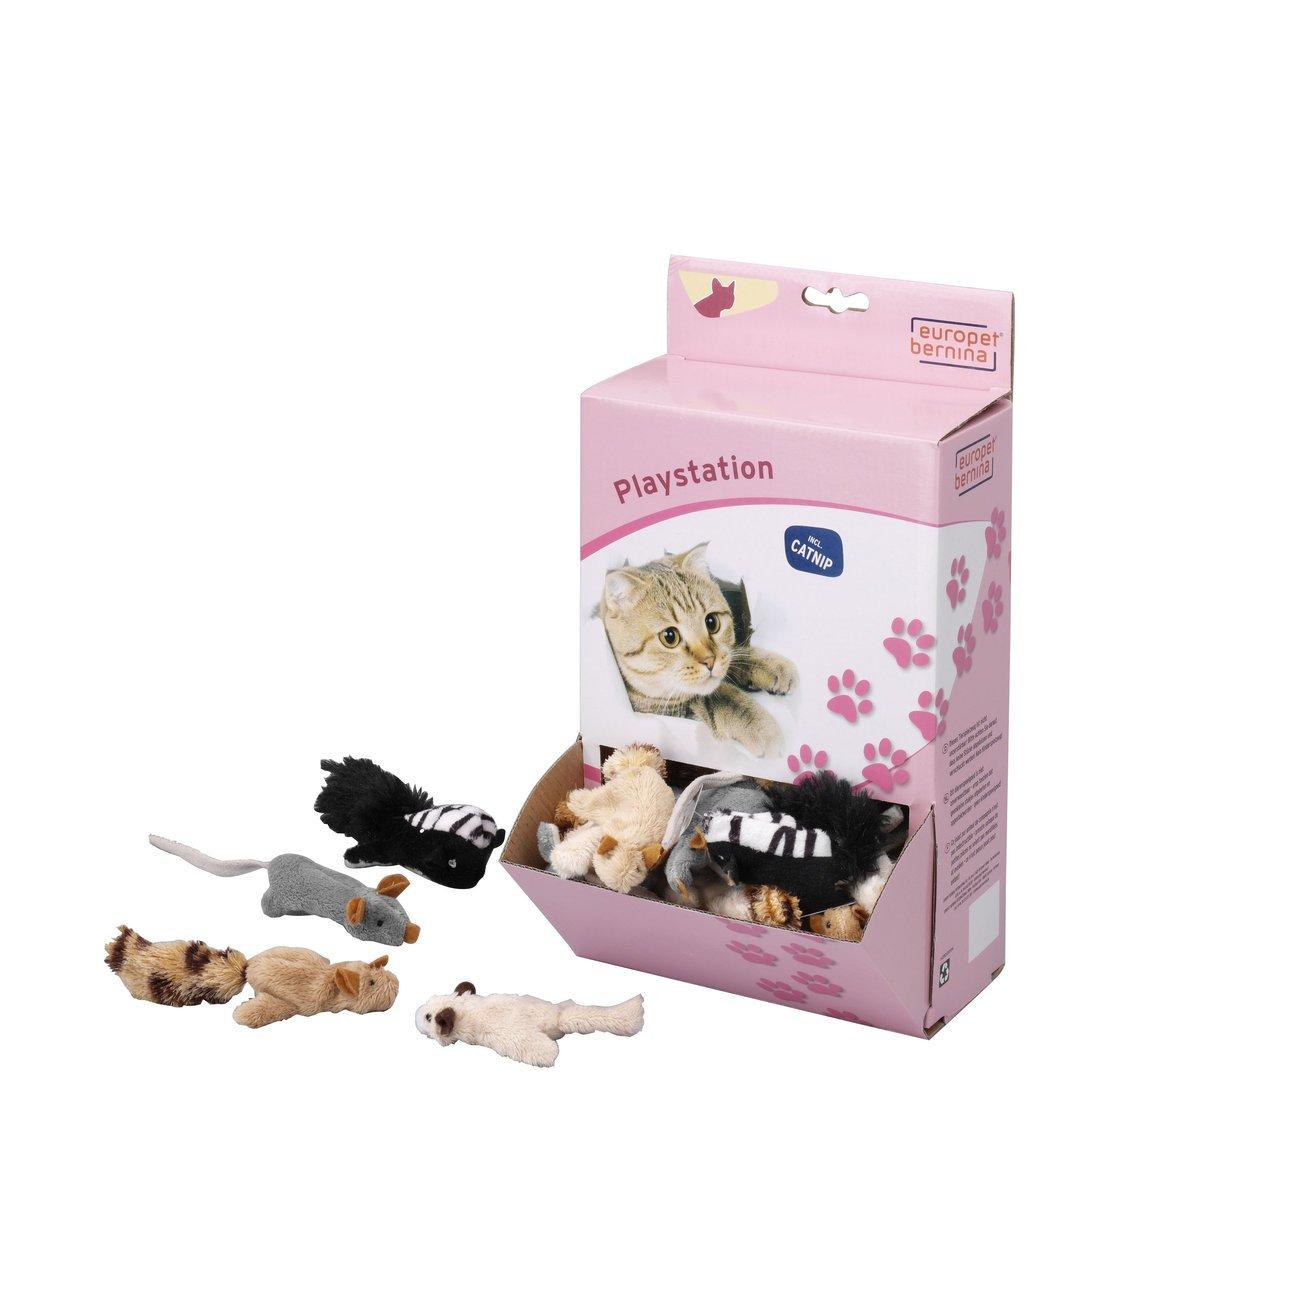 EBI Catnip-Spielzeug mit Katzenminze, 7 cm, 1 Stück